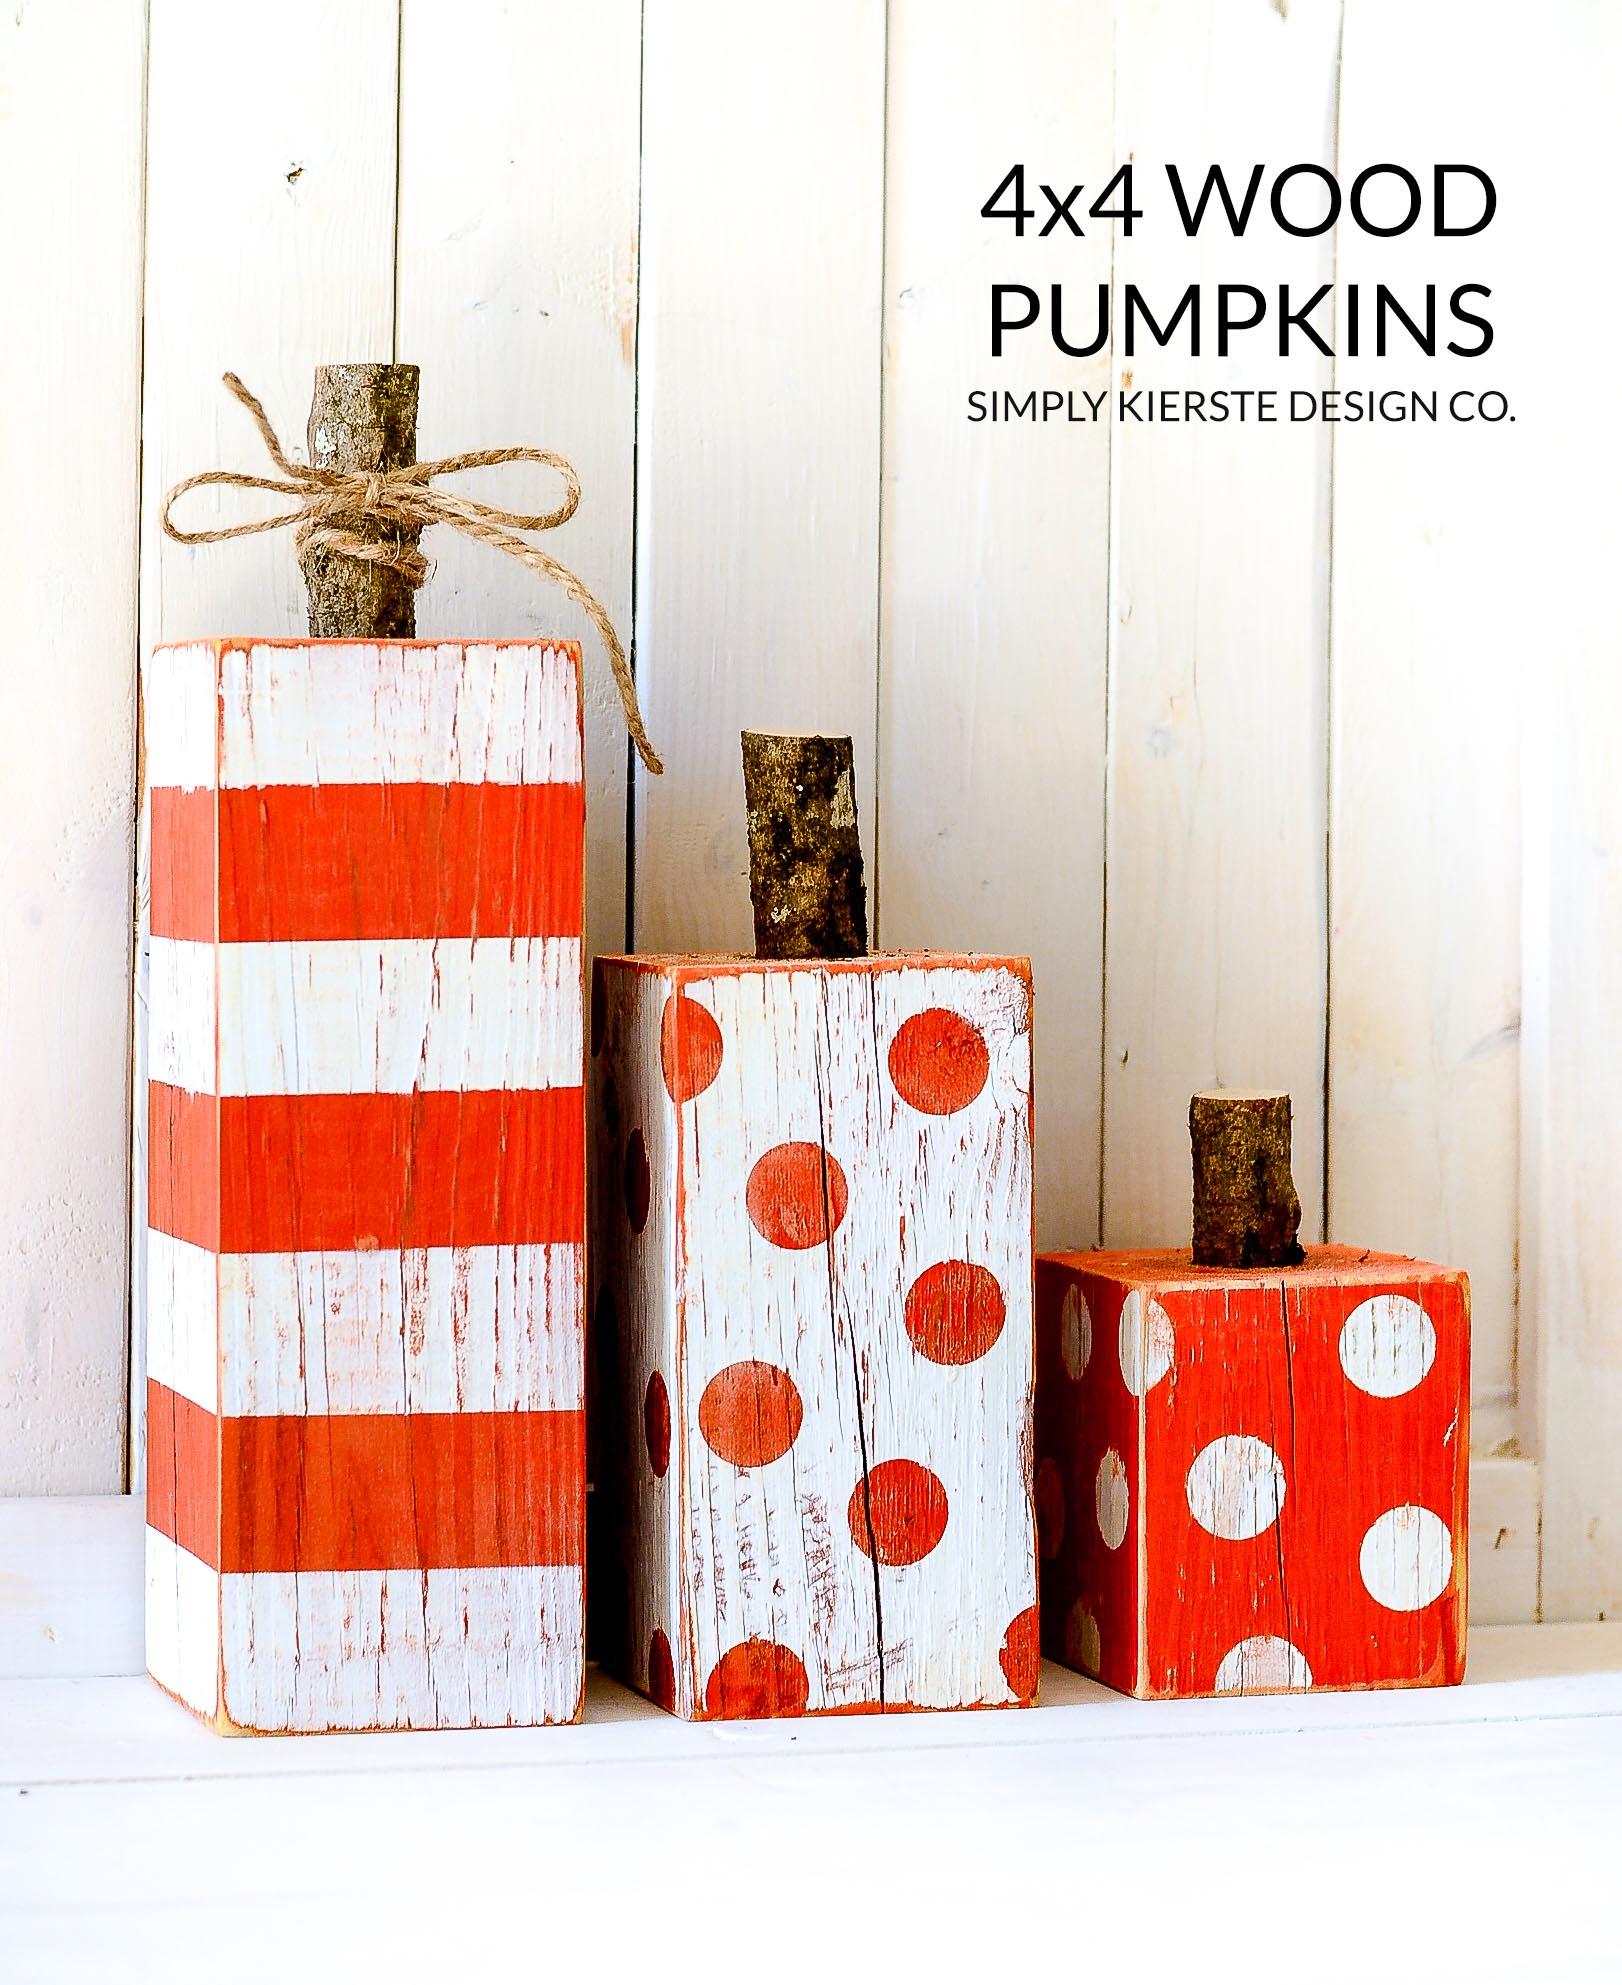 4x4 Wood Pumpkins | simplykierste.com